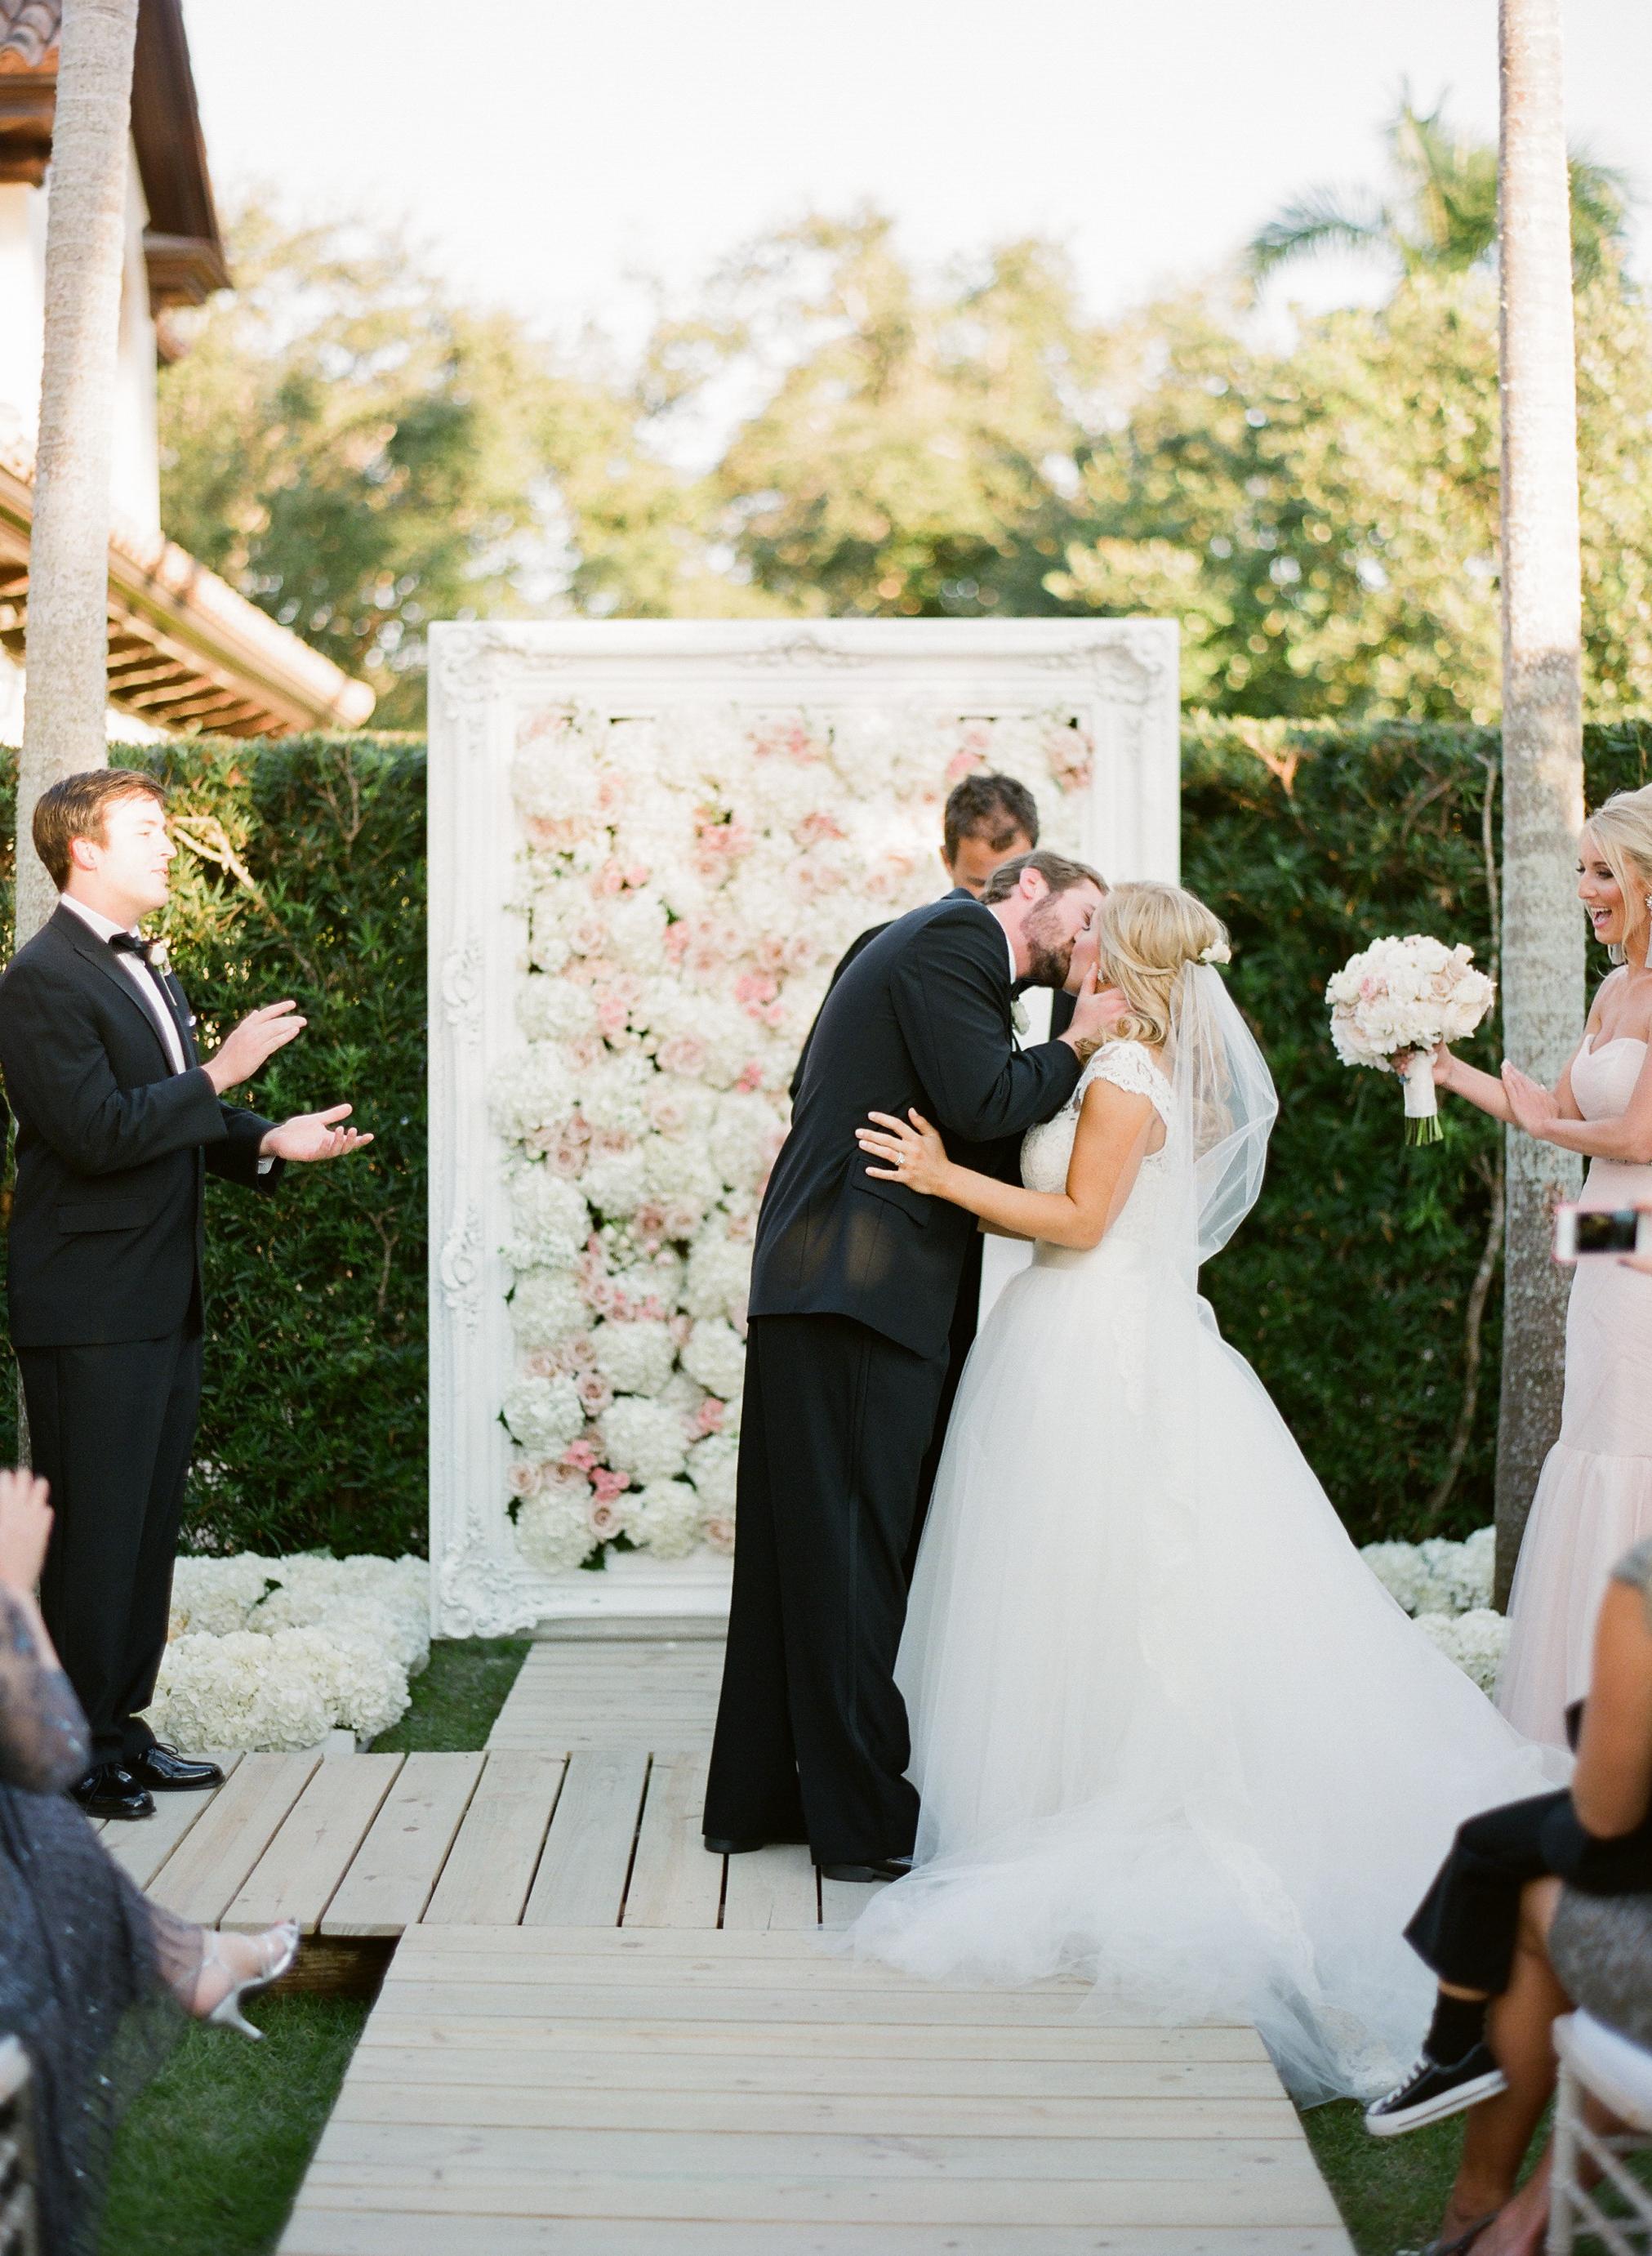 Ceci_New_York_Florida_Wedding_Style_Bride_Watercolor_Real_Custom_Luxury_76.jpg